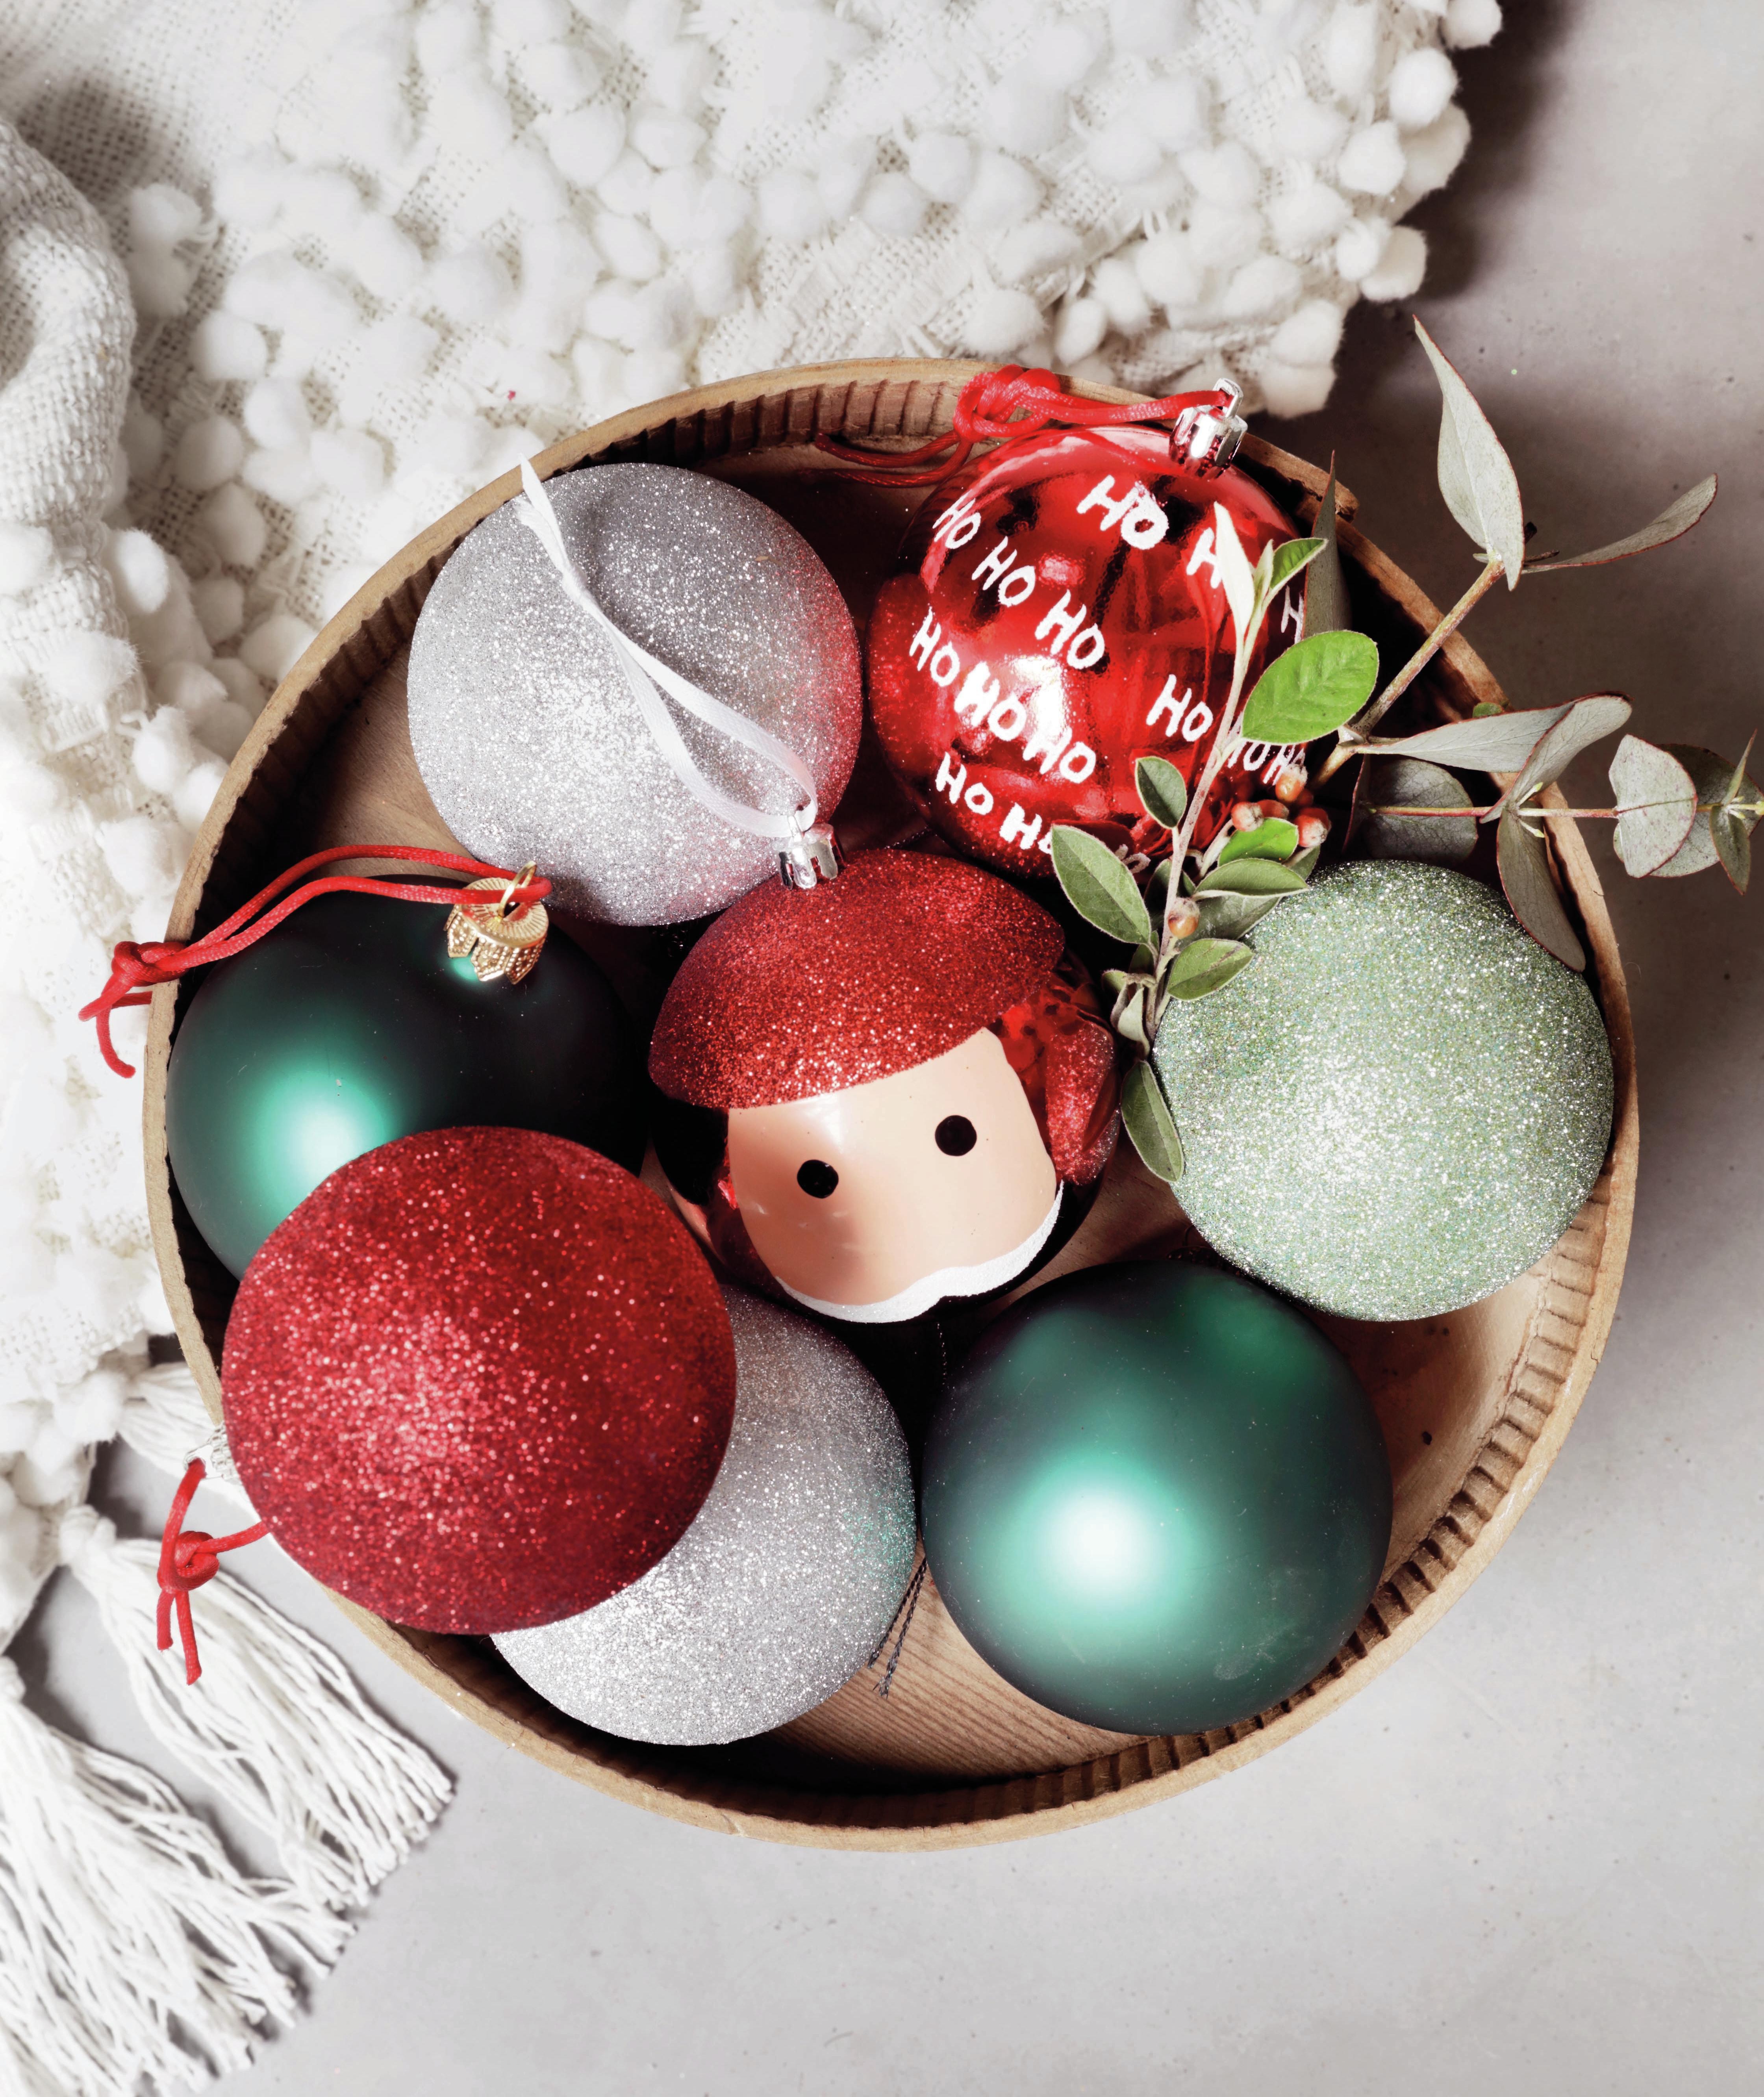 kersttrend 2018: traditioneel modern